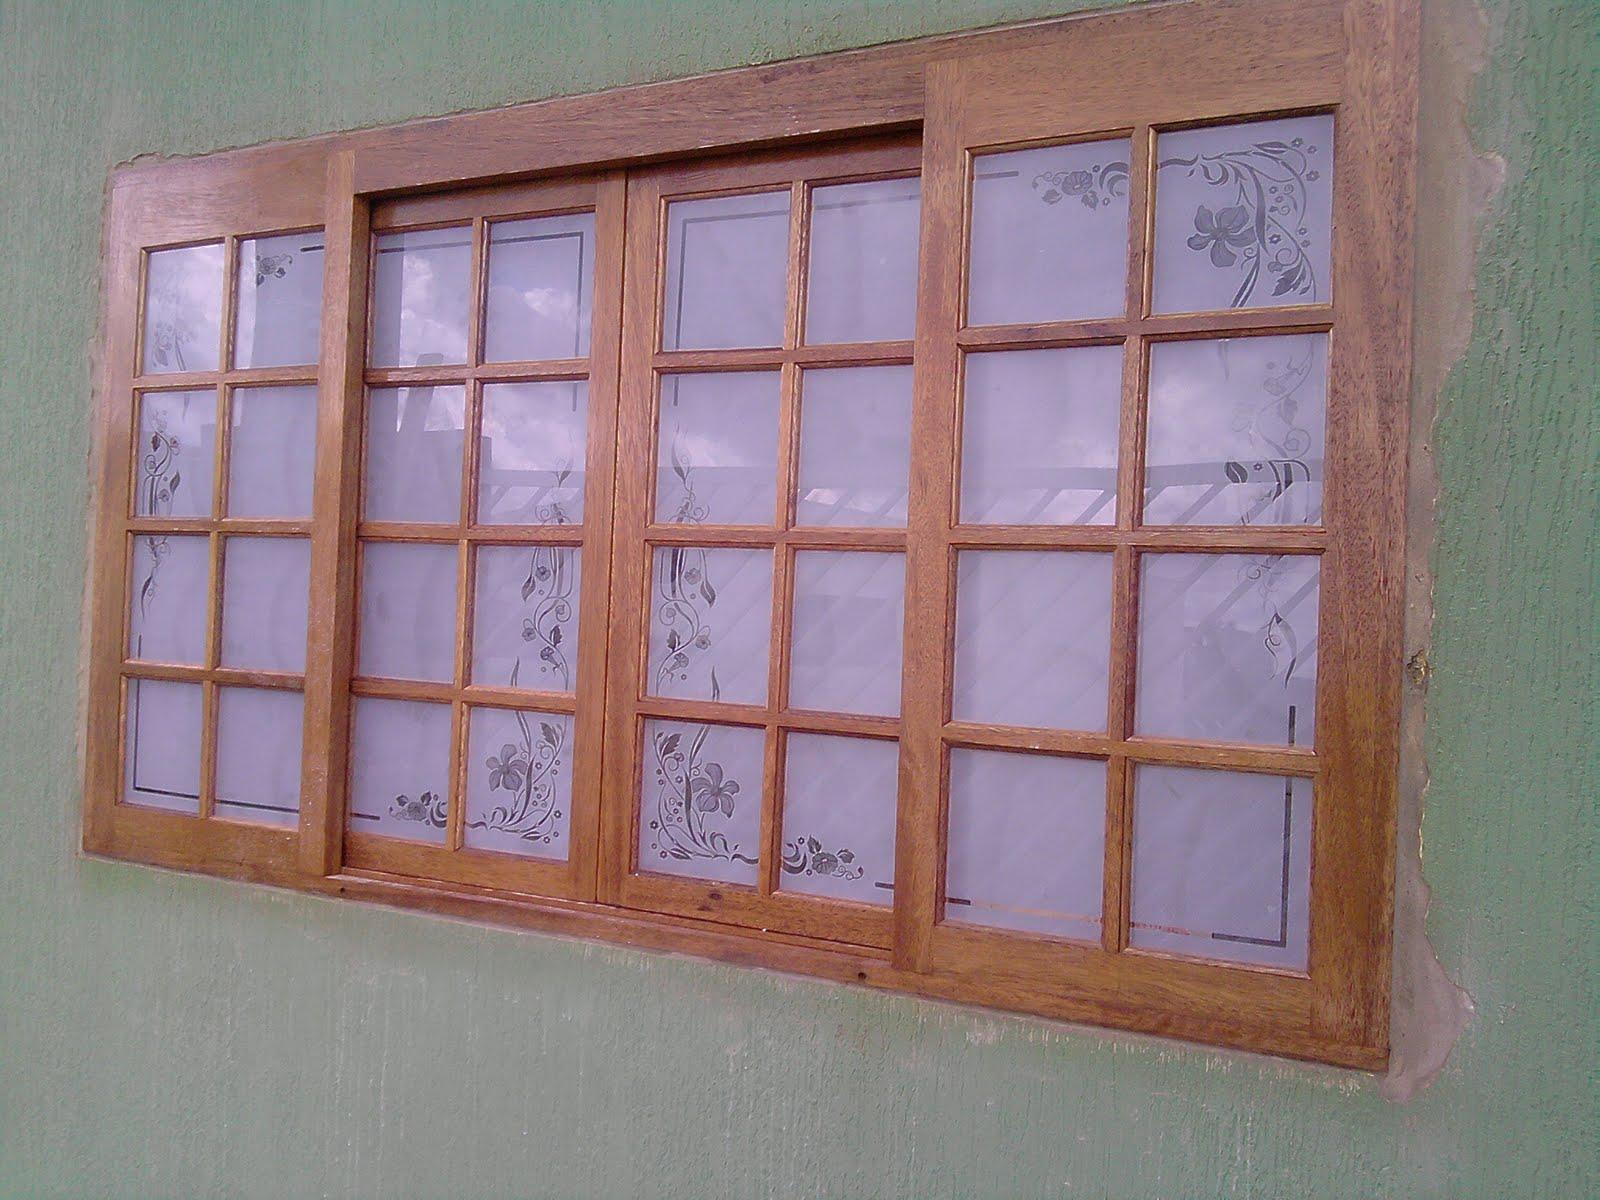 #381713 VIDROS JATEADOS e TEMPERADOS: janelas jateadas e desenhos sombreados 508 Janelas E Vitros De Vidro